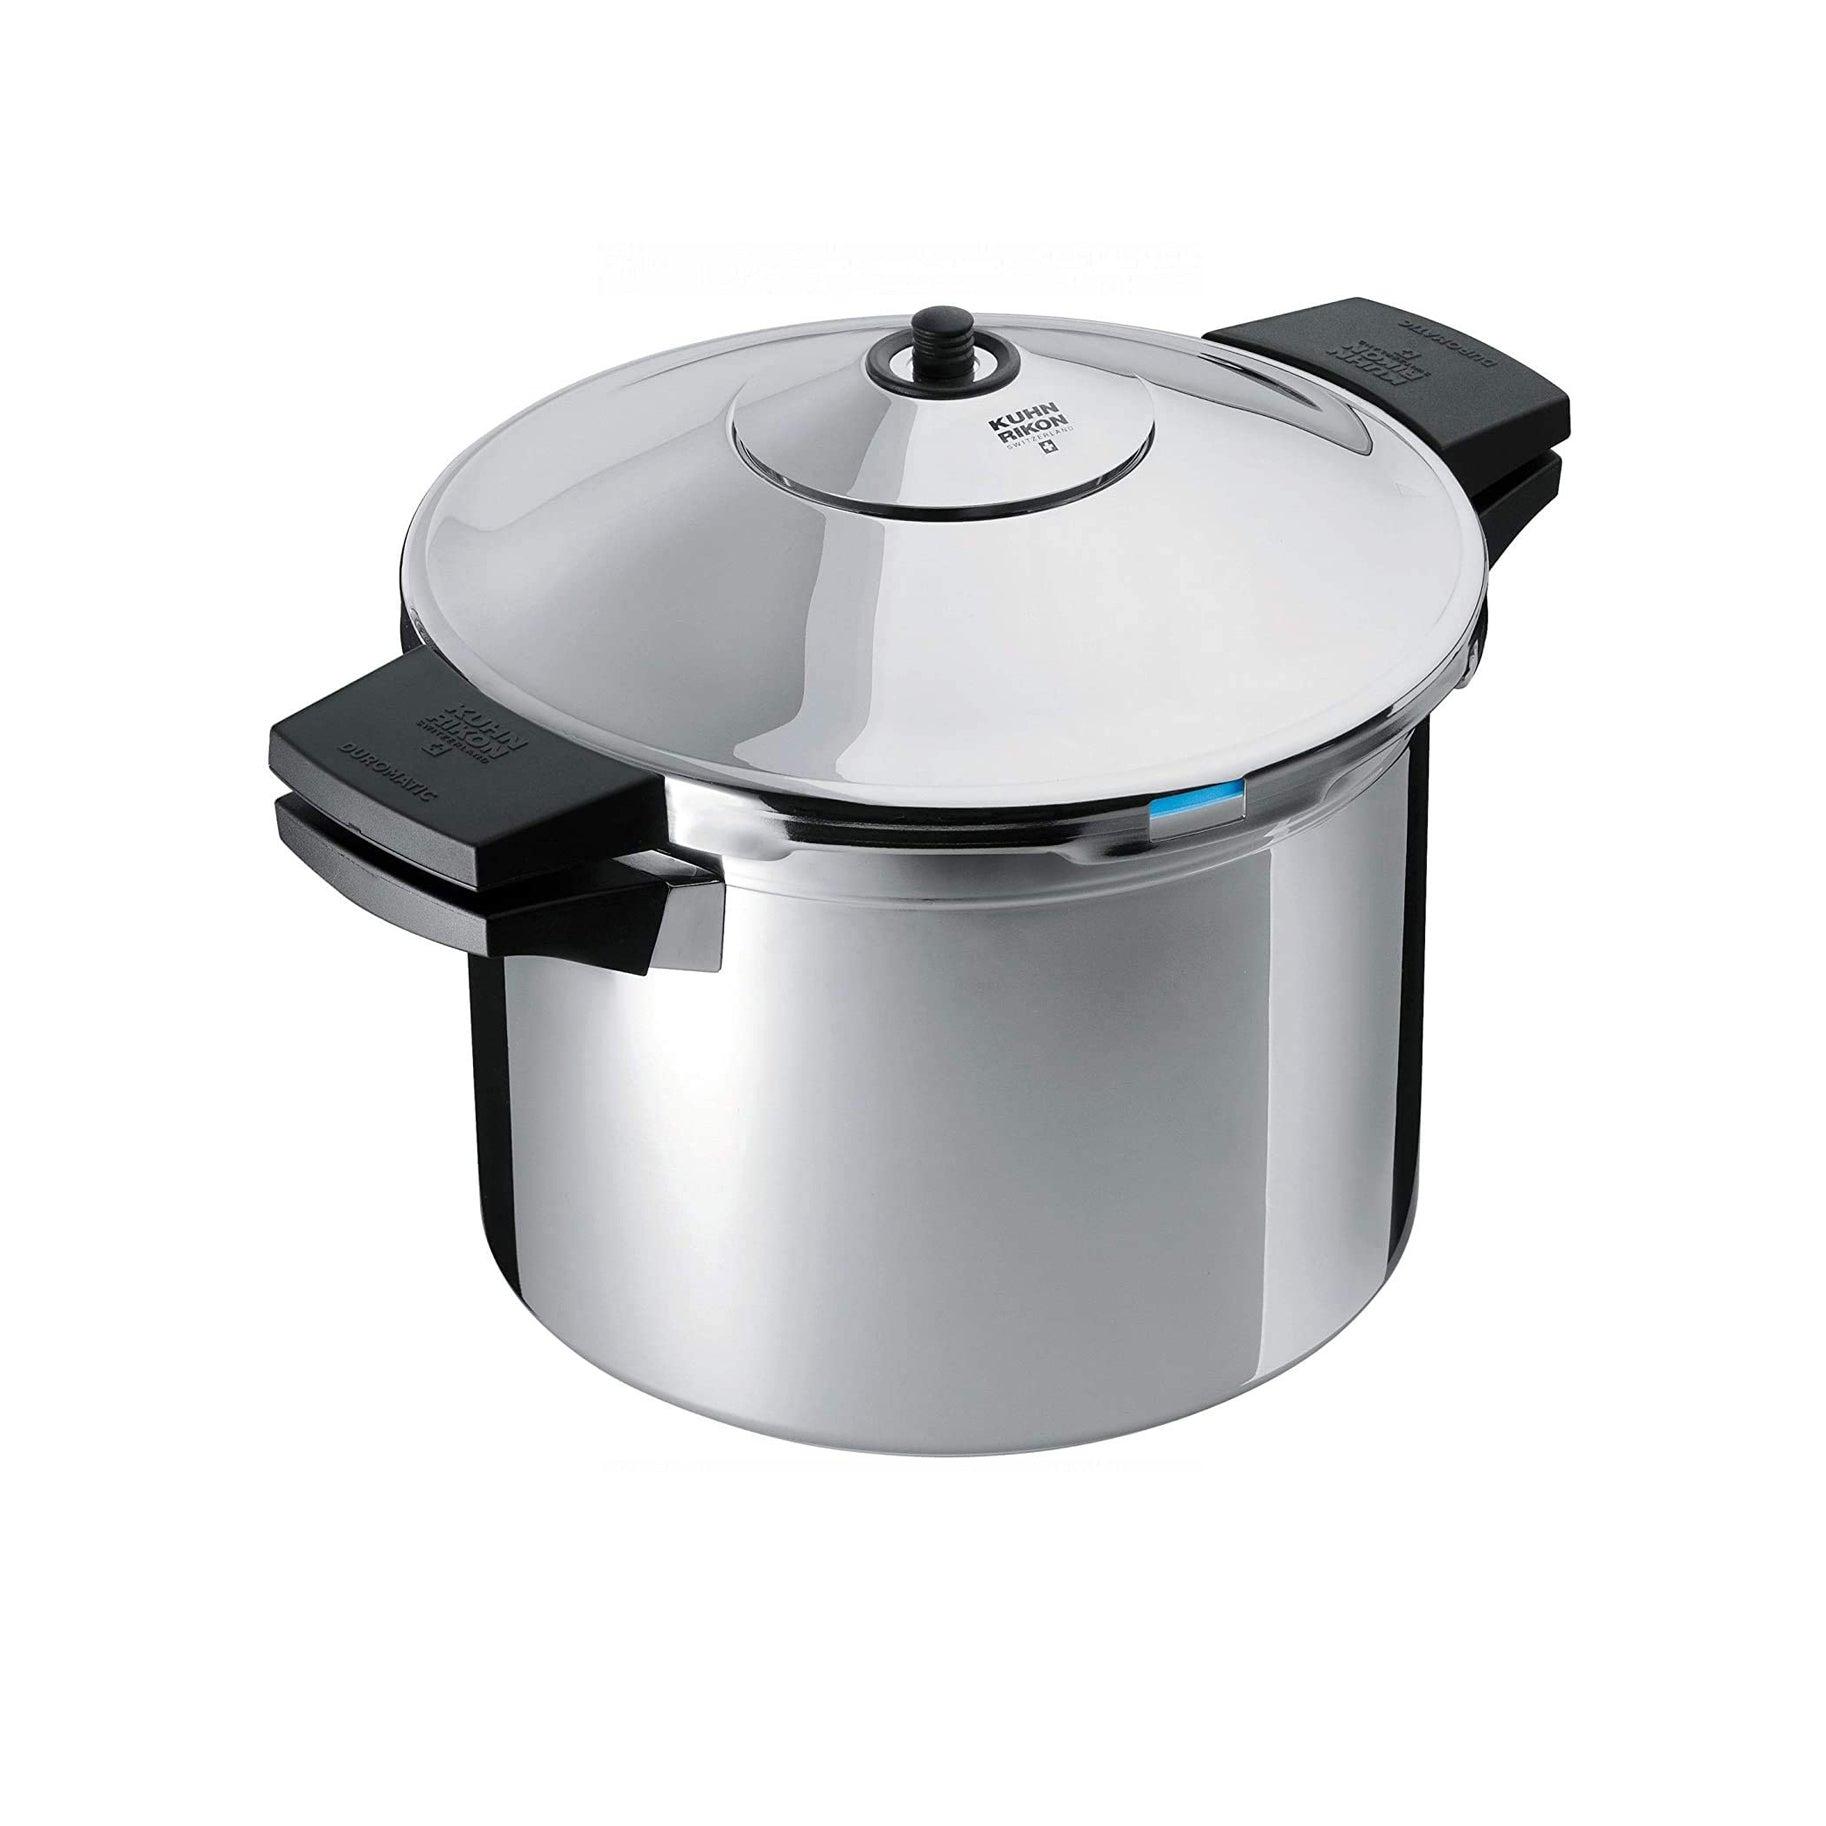 The Best Pressure Cooker Option: Kuhn Rikon 8.4 Quart Pressure Cooker